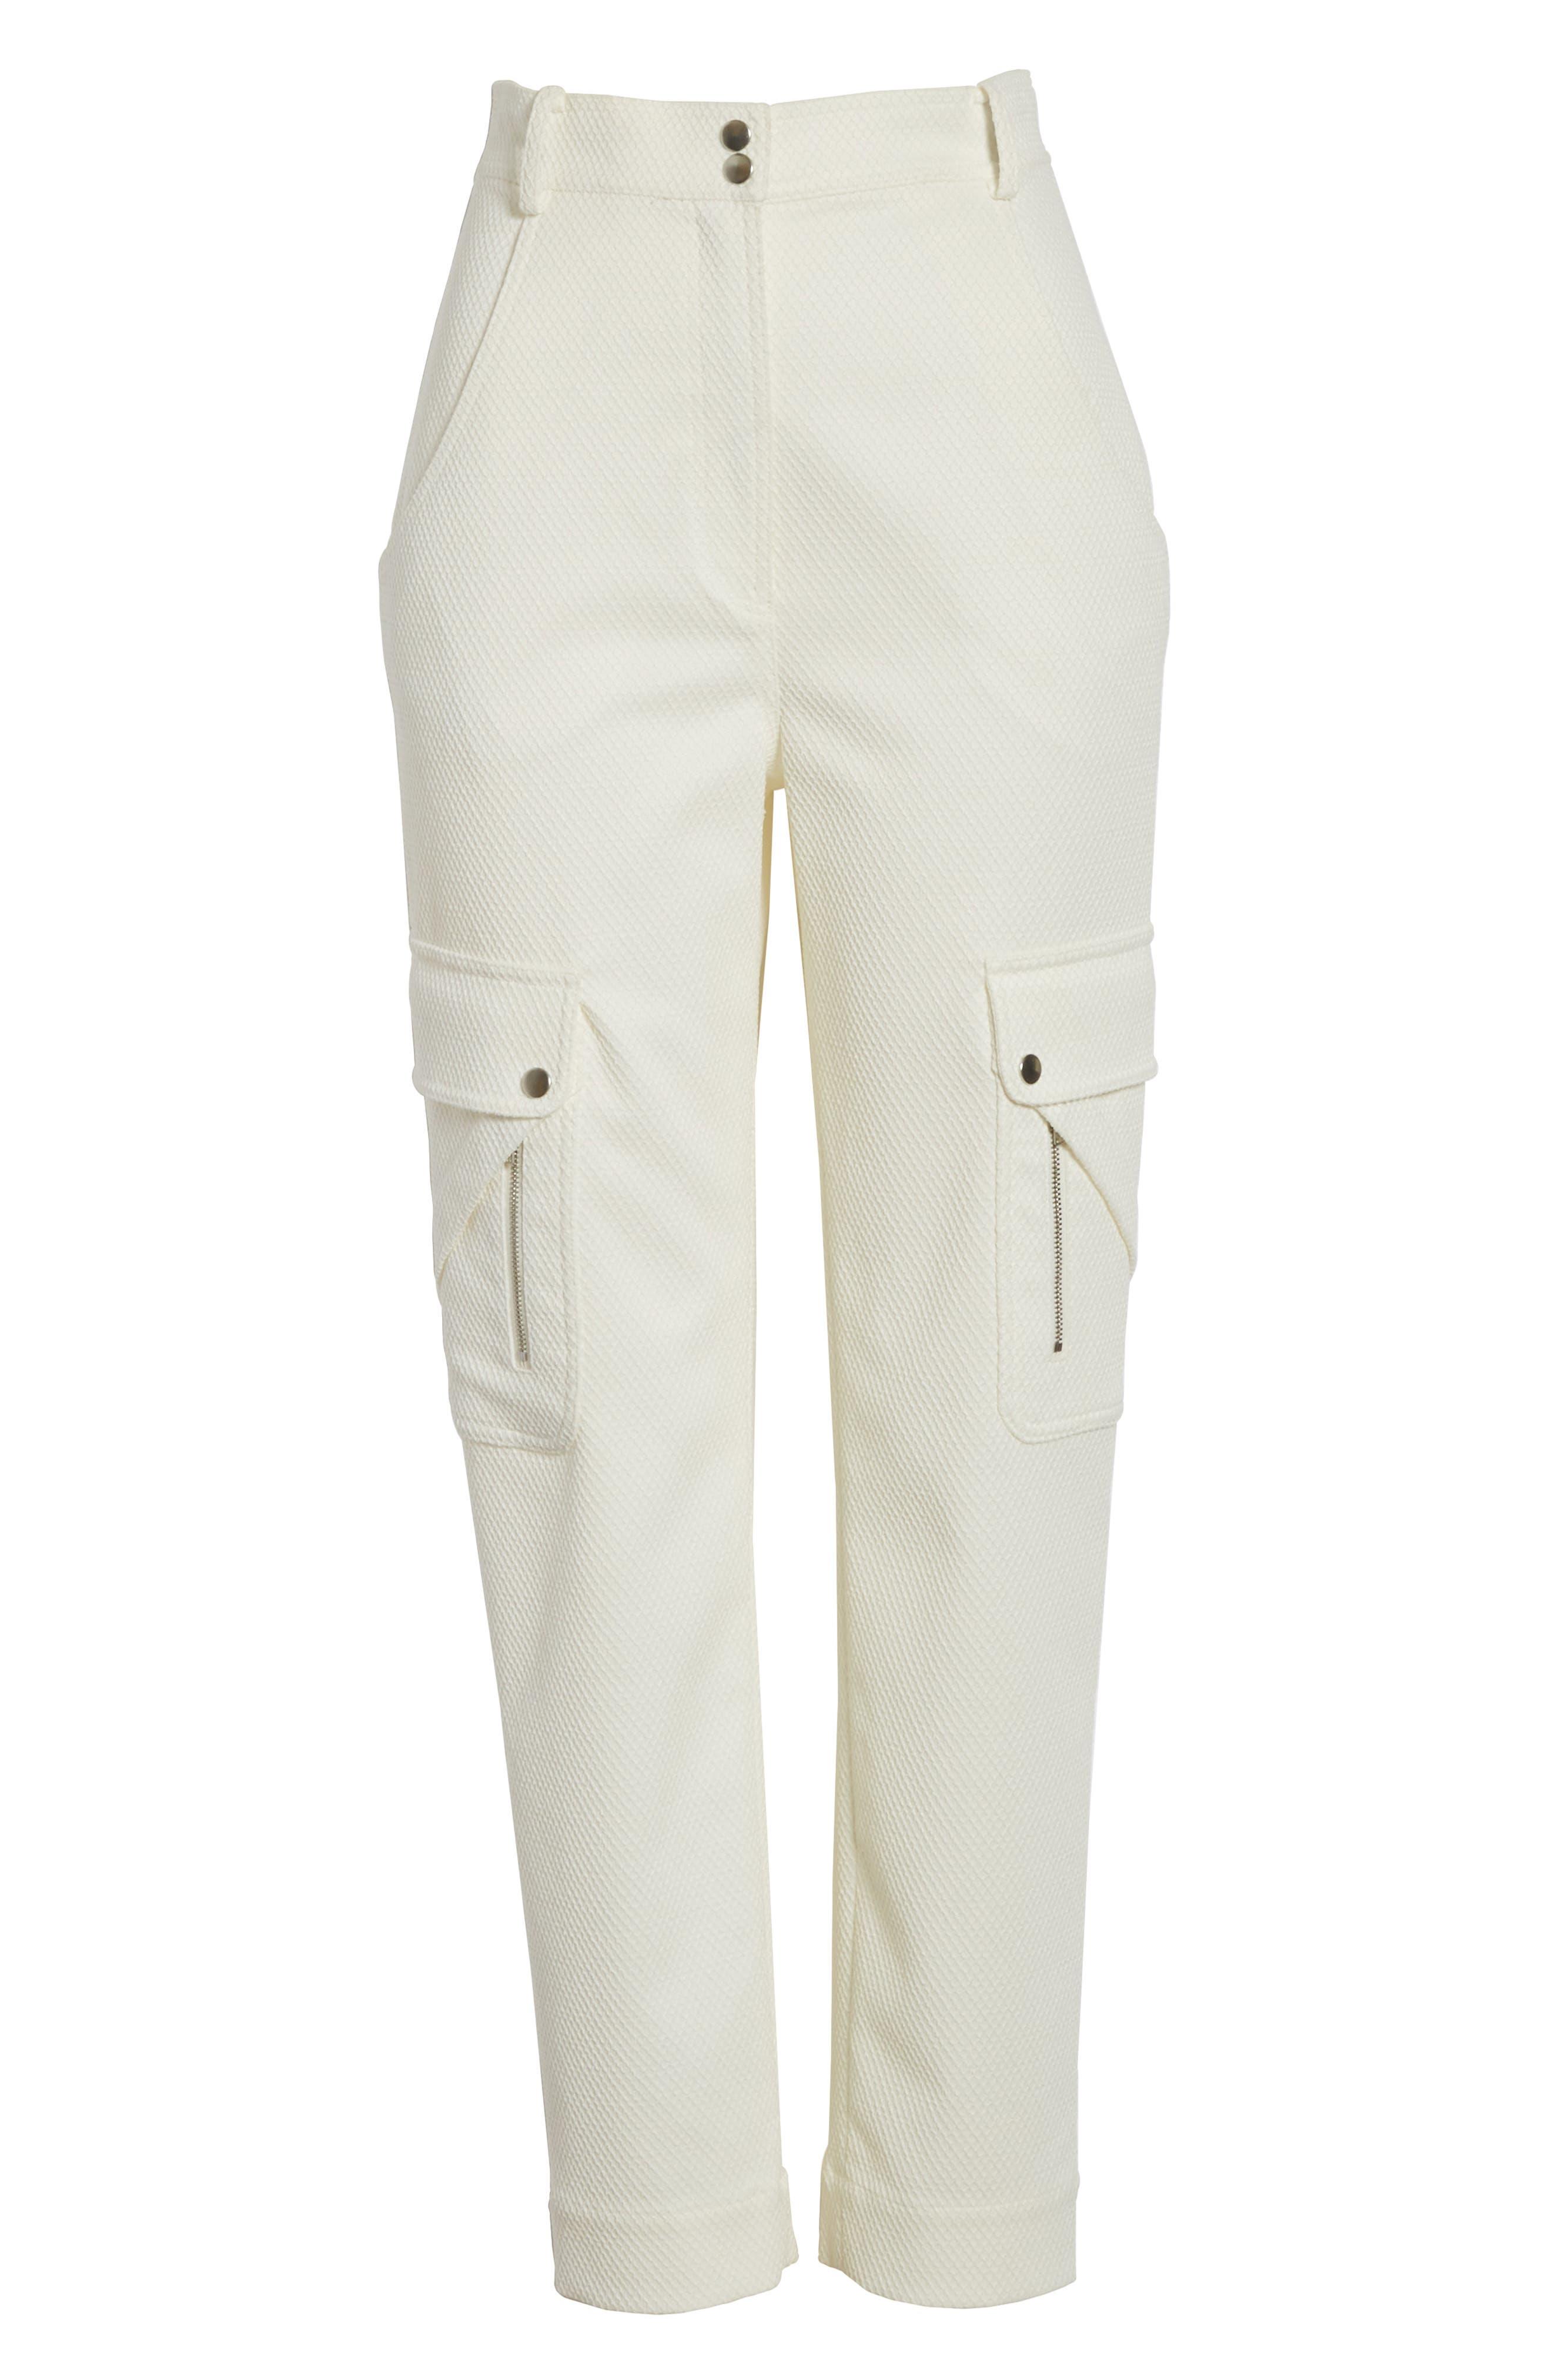 Textured Stretch Cotton Blend Utility Pants,                             Alternate thumbnail 6, color,                             Soft White